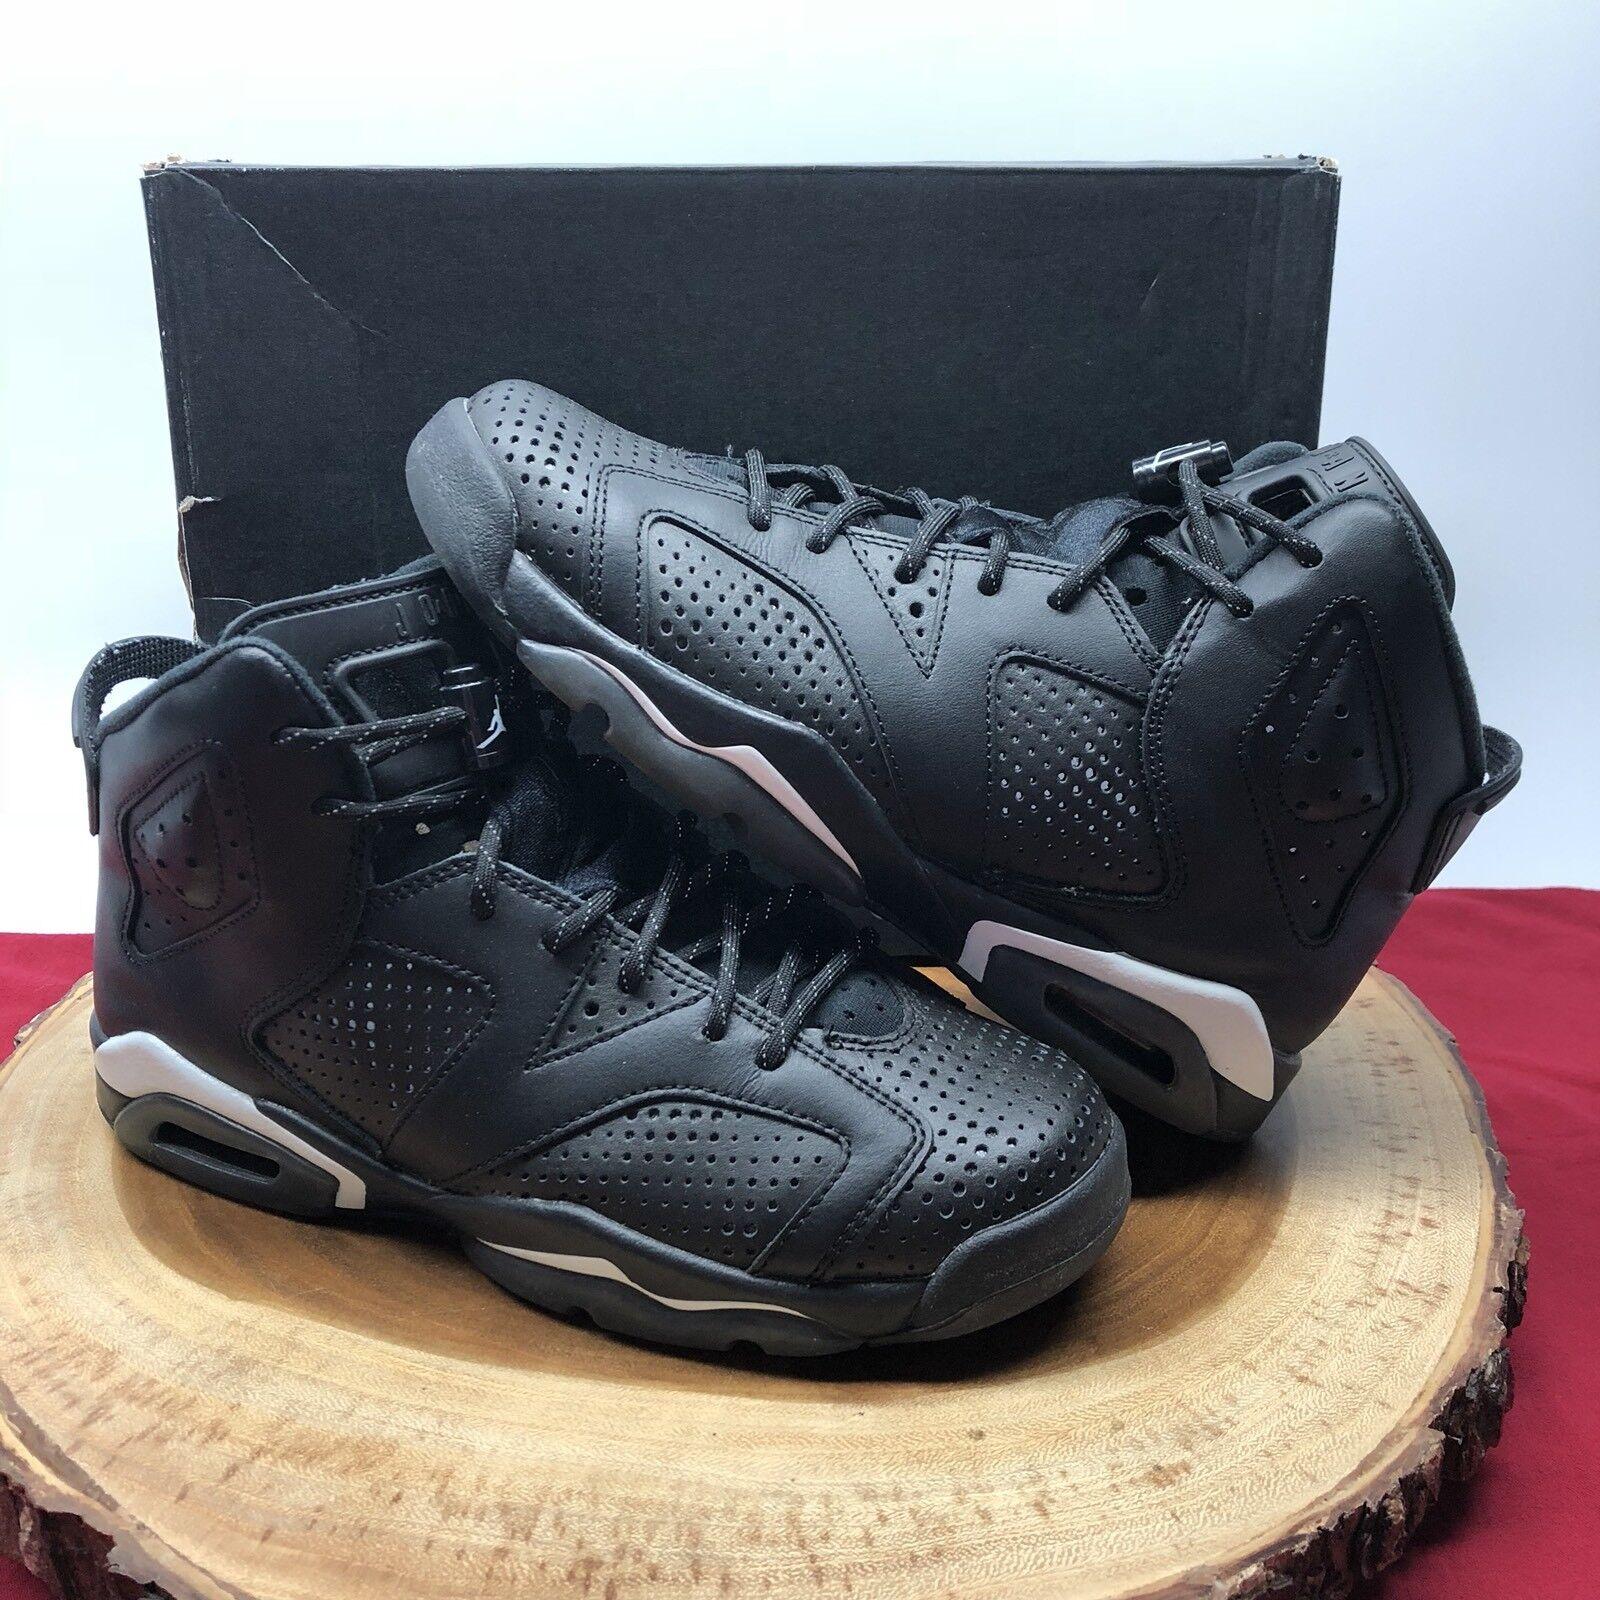 Nike air jordan retro vi gatto nero 3 dimensioni 384665 020 vii - iii, iv, xi - xii